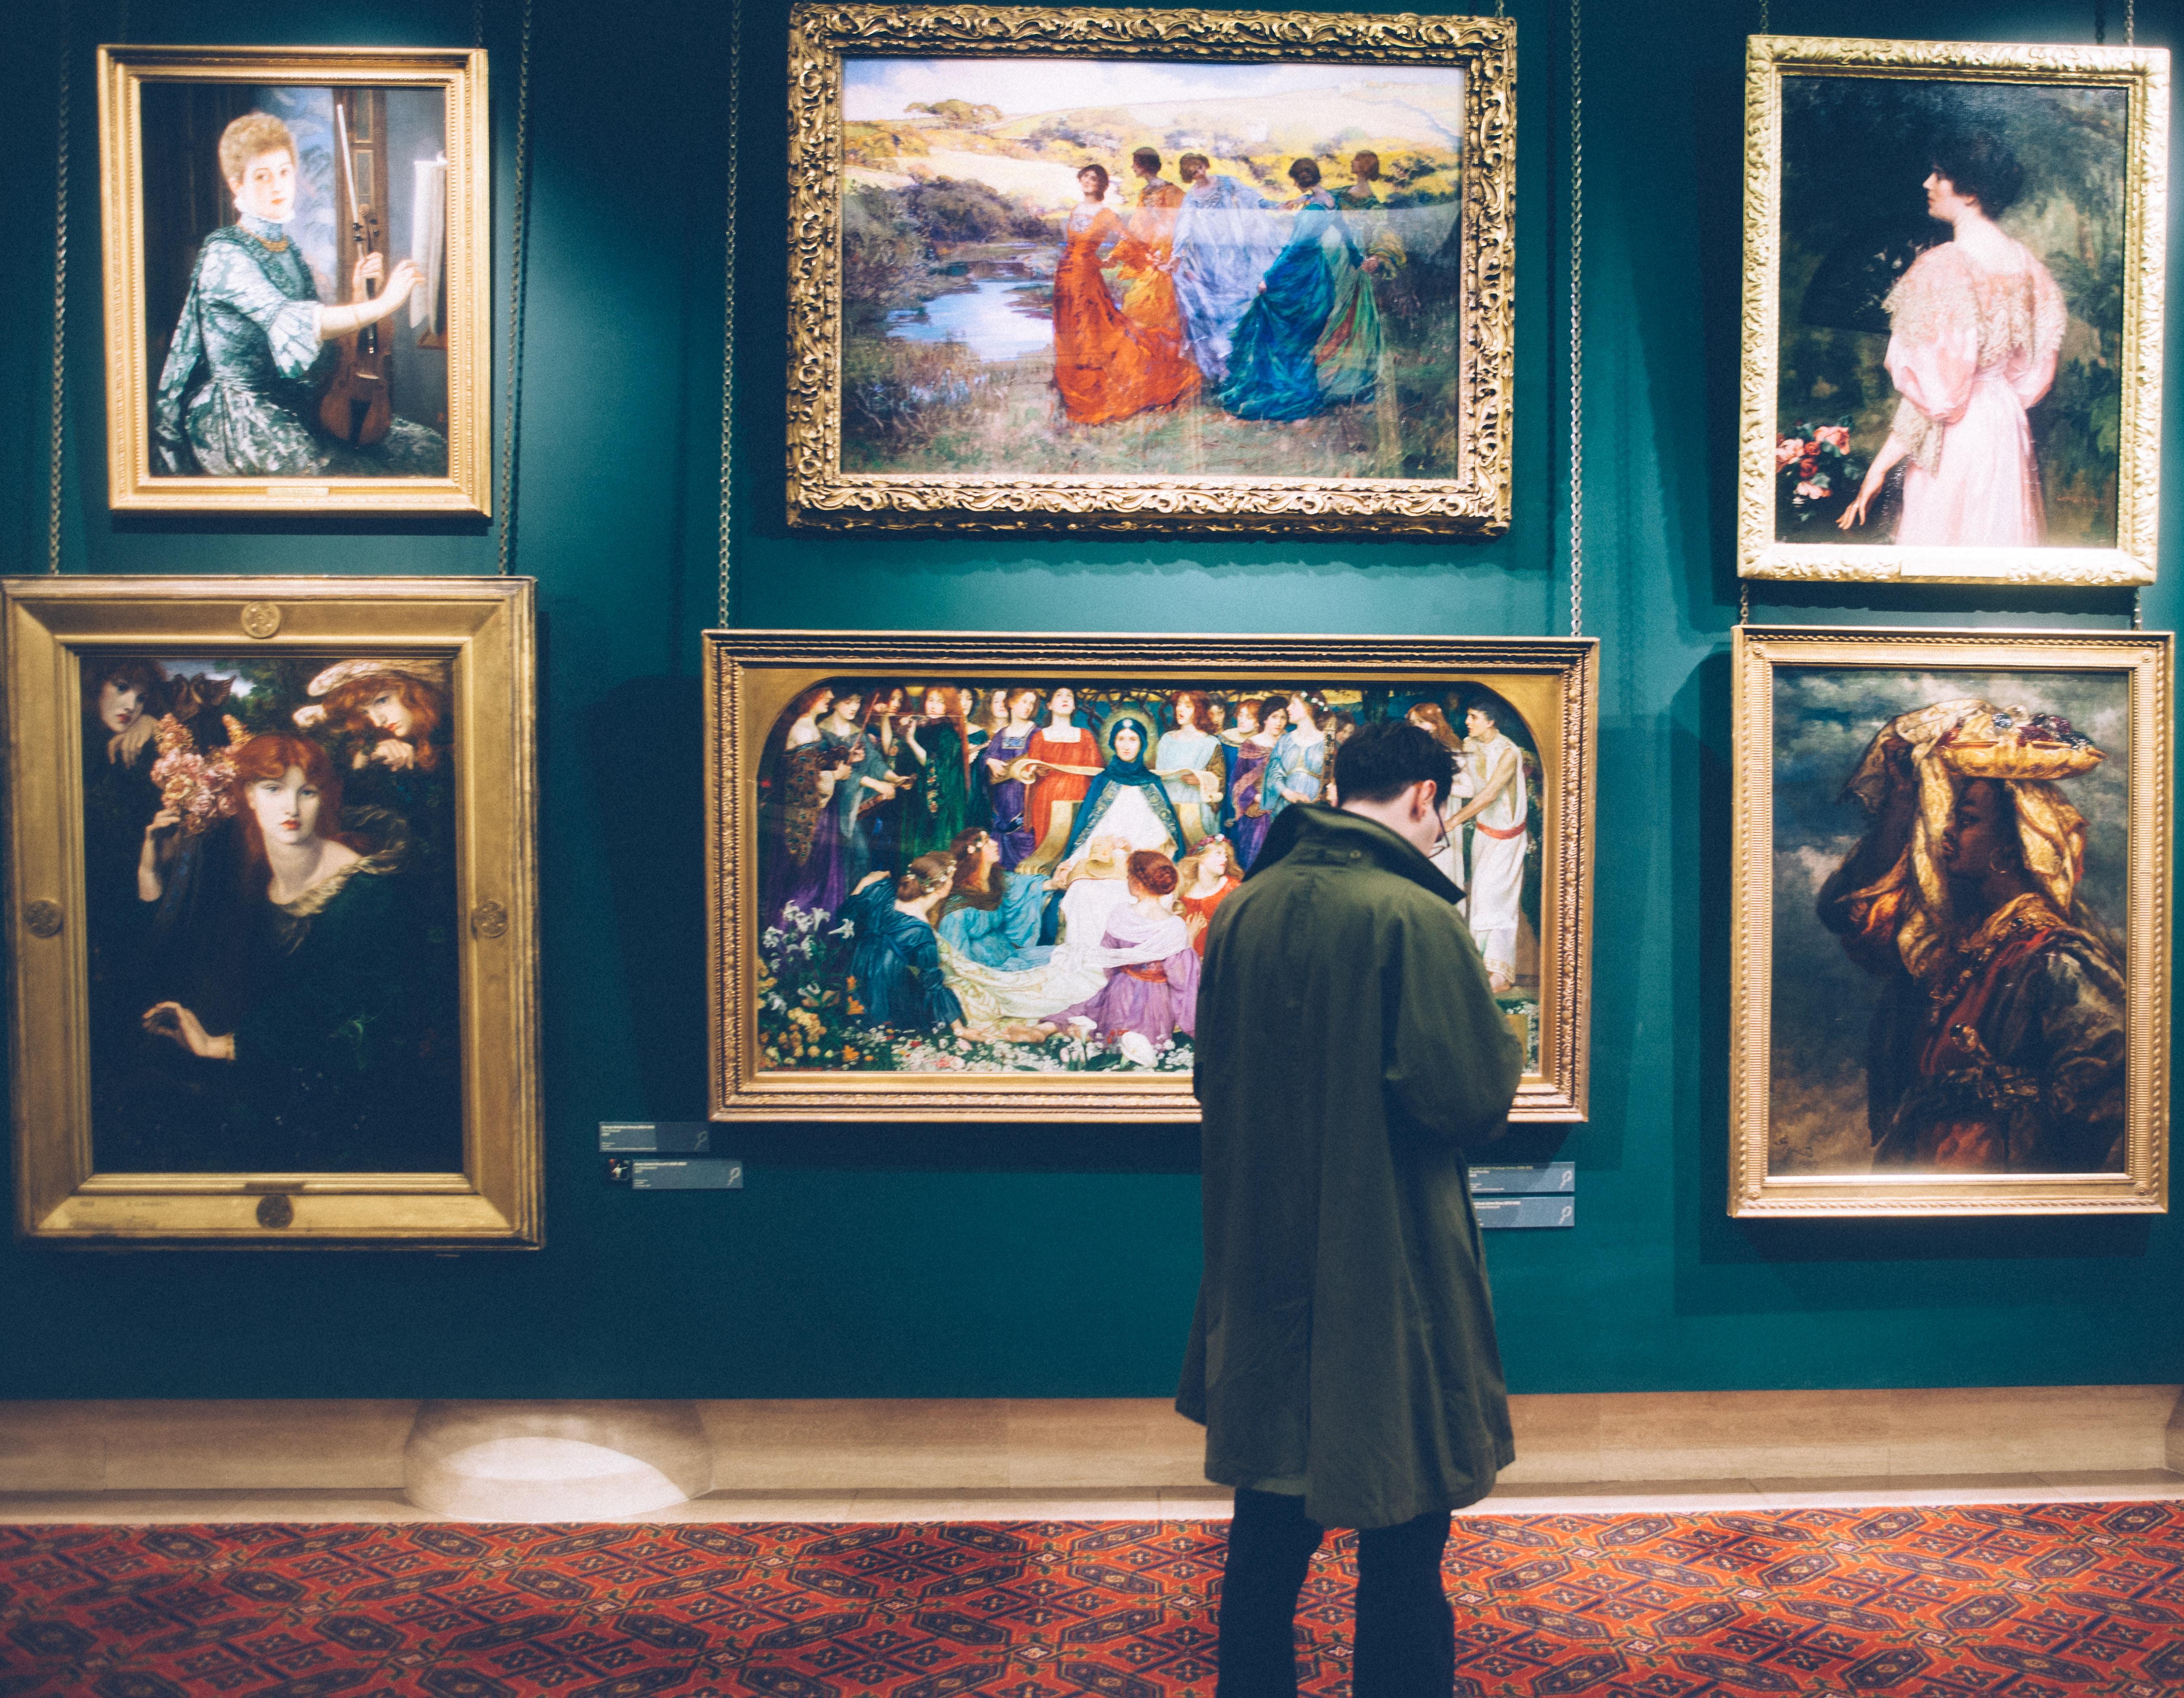 Man in long khaki jacket standing in art gallery browsing classic paintings